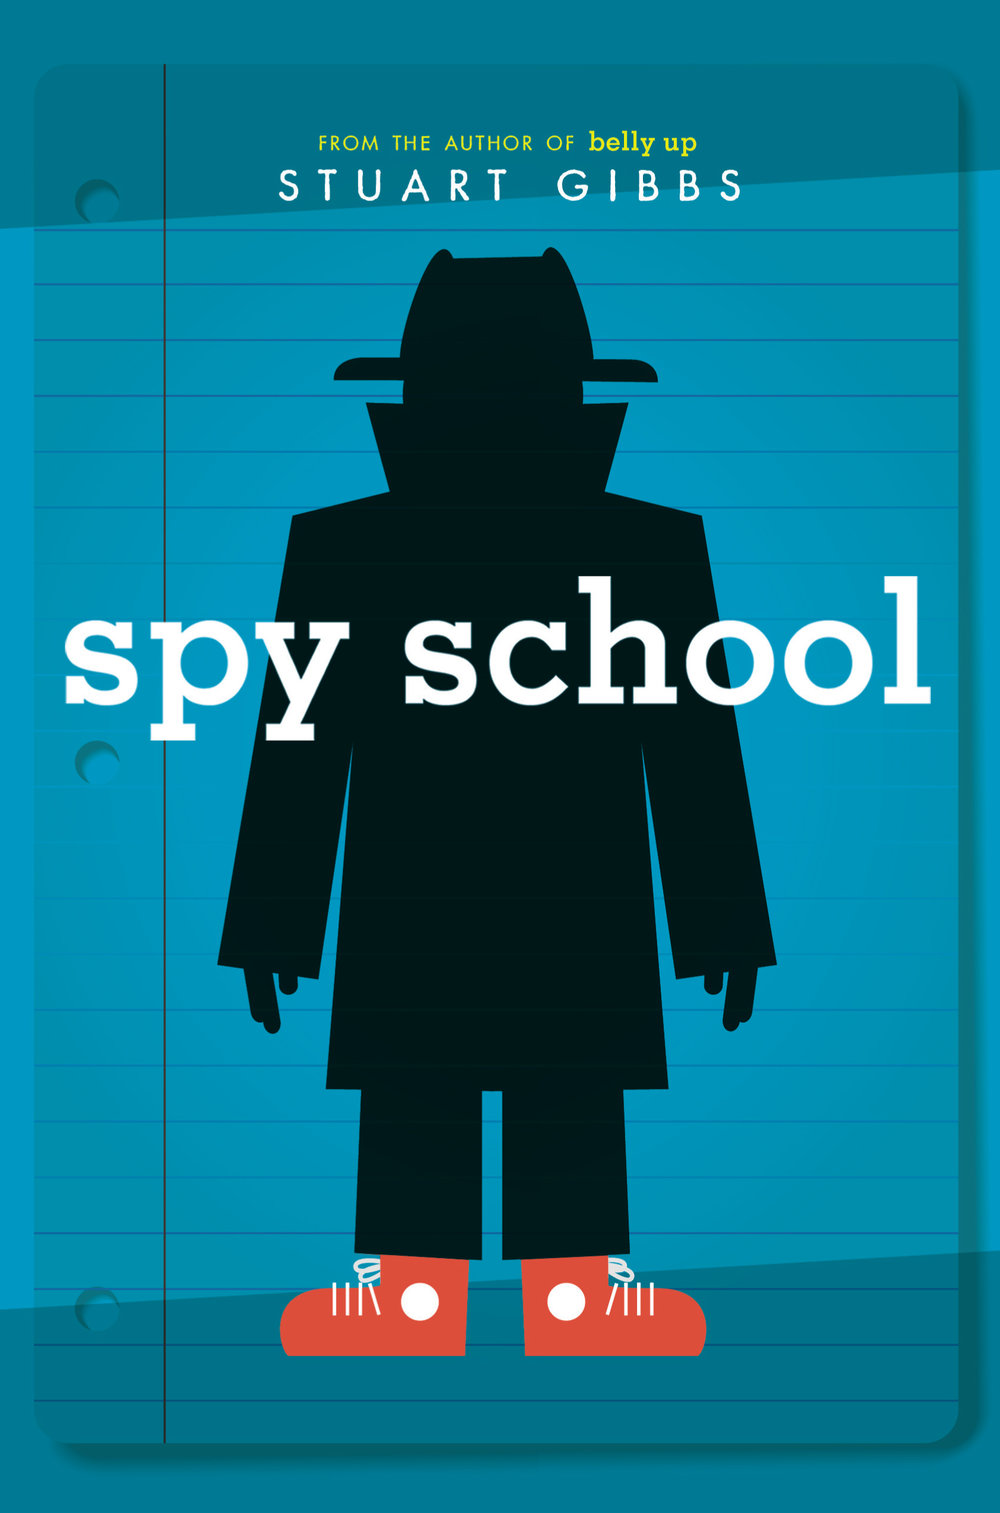 gibbs-spy-school.jpg